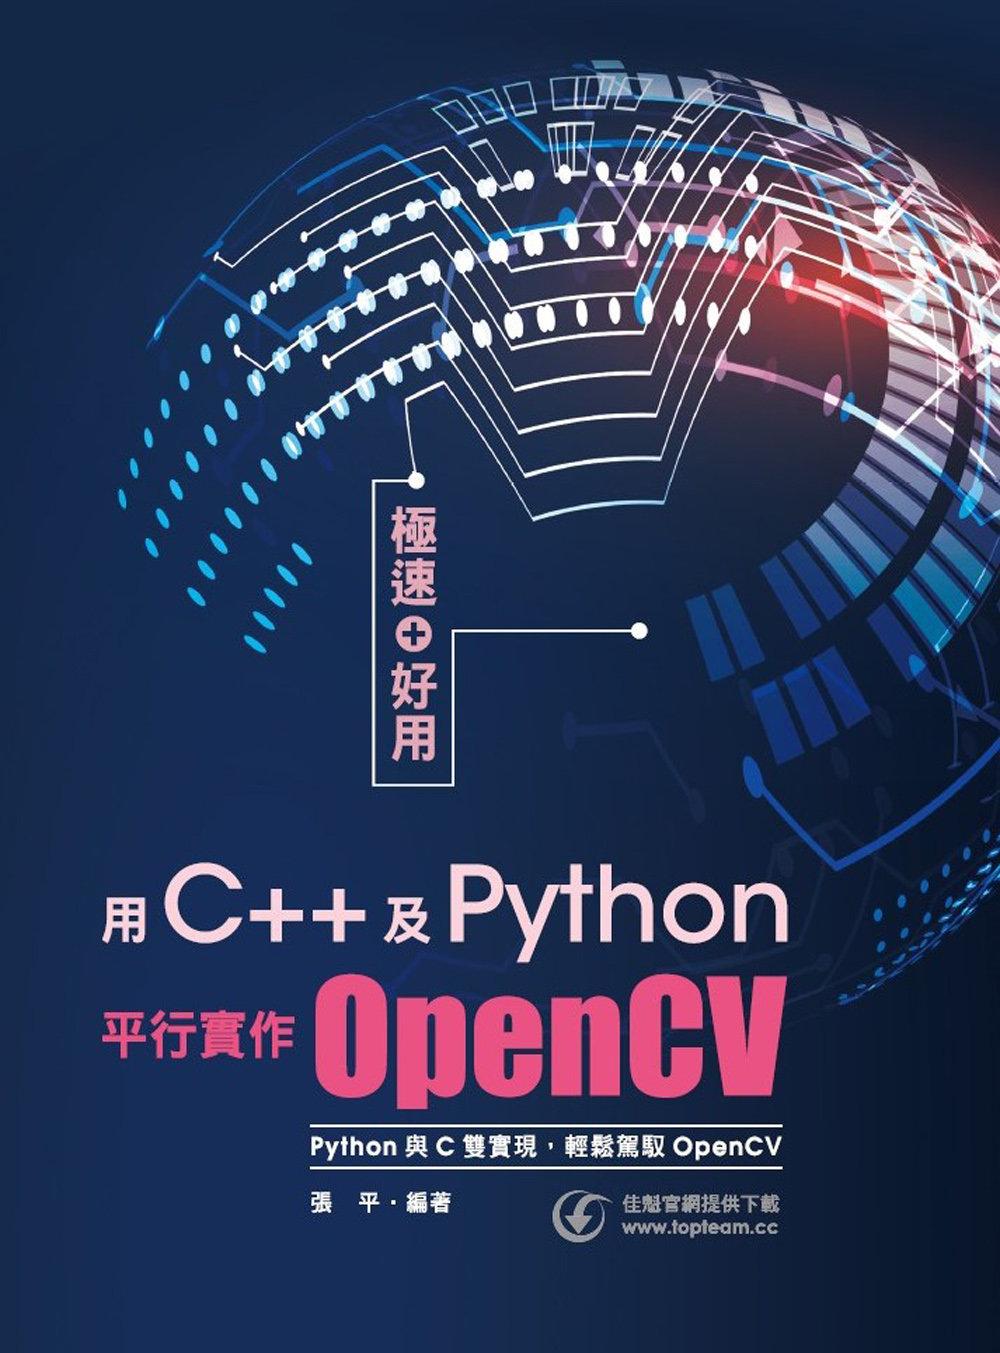 極速+好用:用 C++ 及 Python 平行實作 OpenCV-preview-1